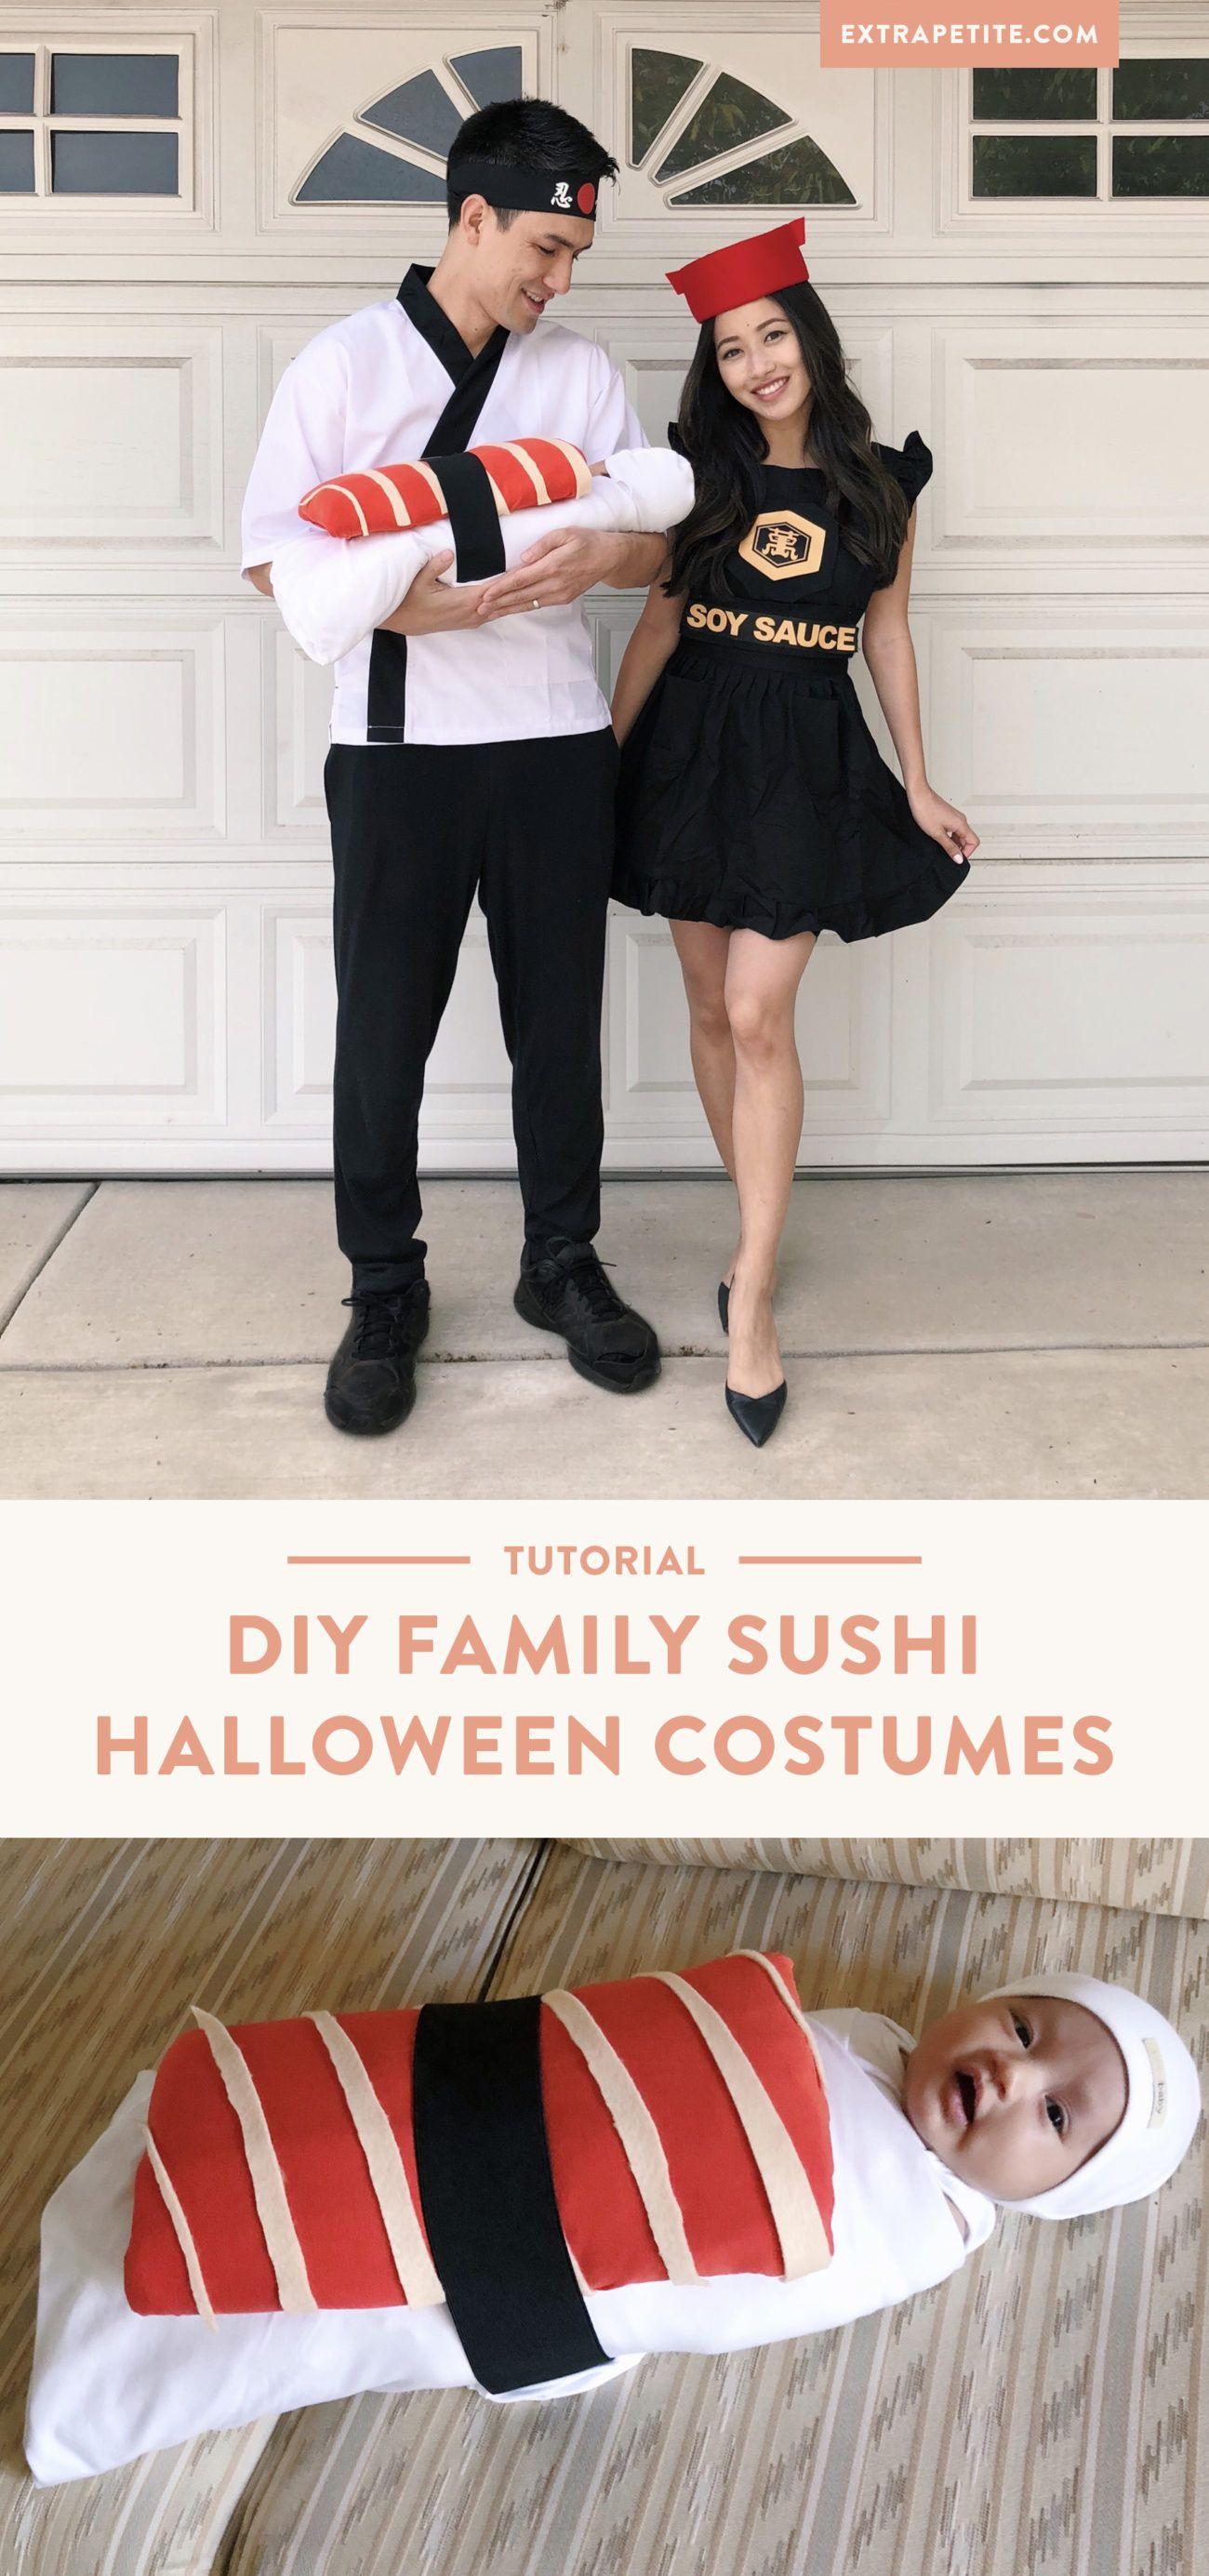 Diy tutorial sushi family halloween costume extra